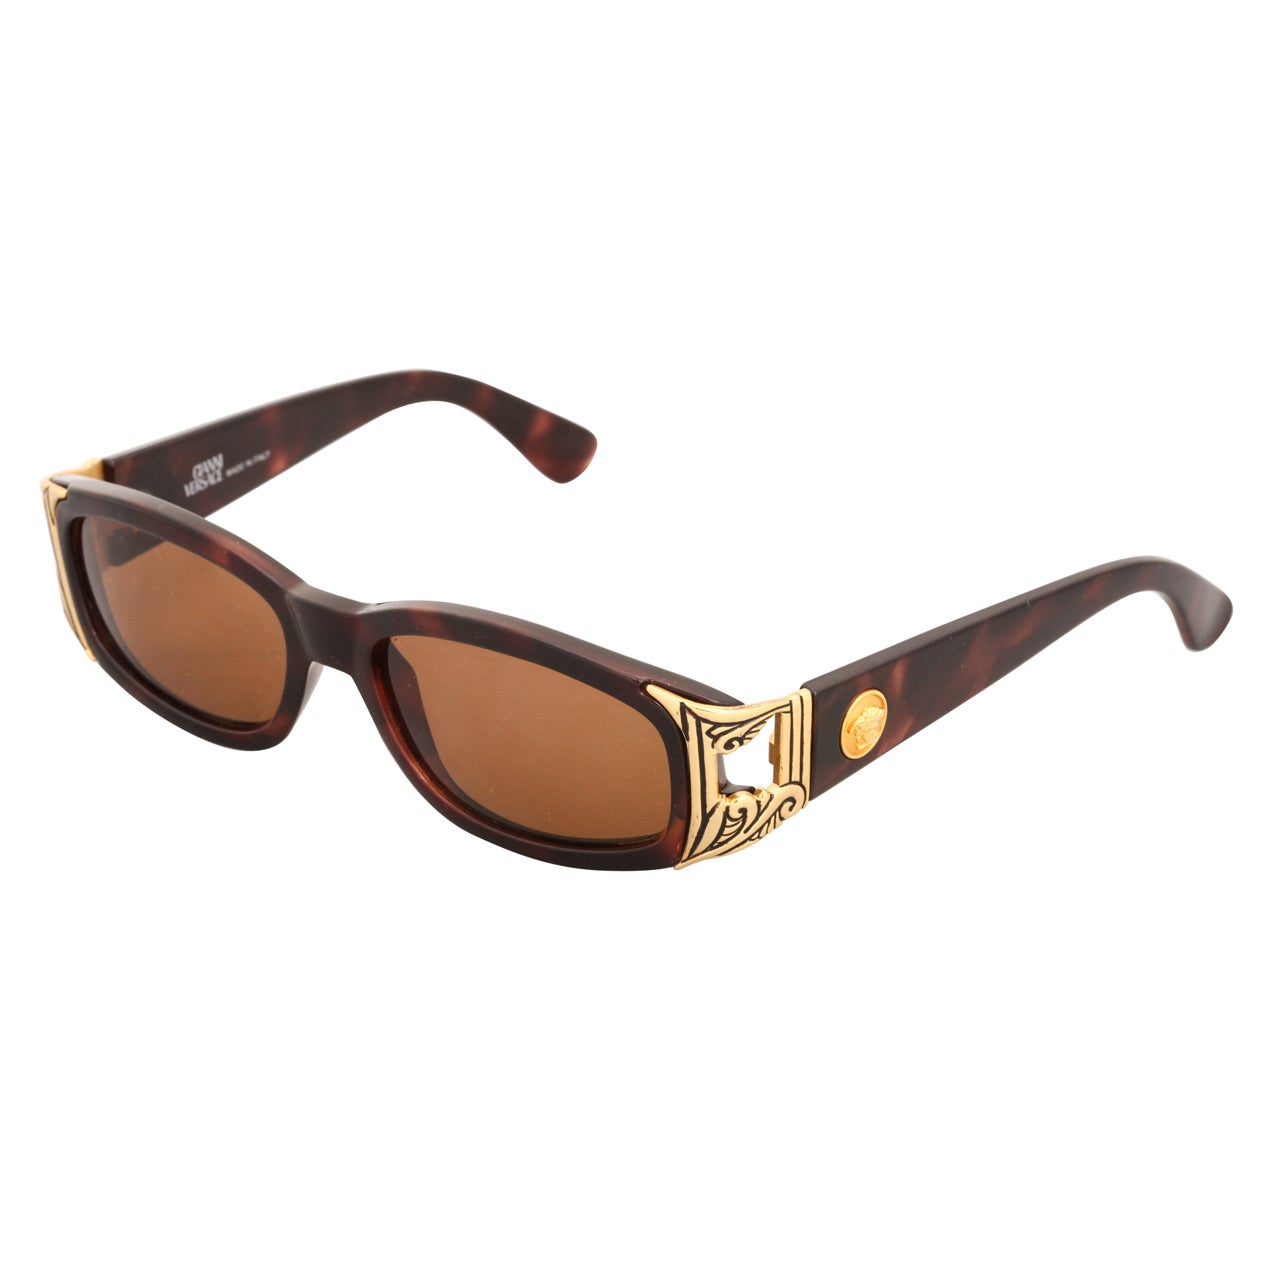 Gianni Versace Sunglasses Mod 482 COL 900 For Sale